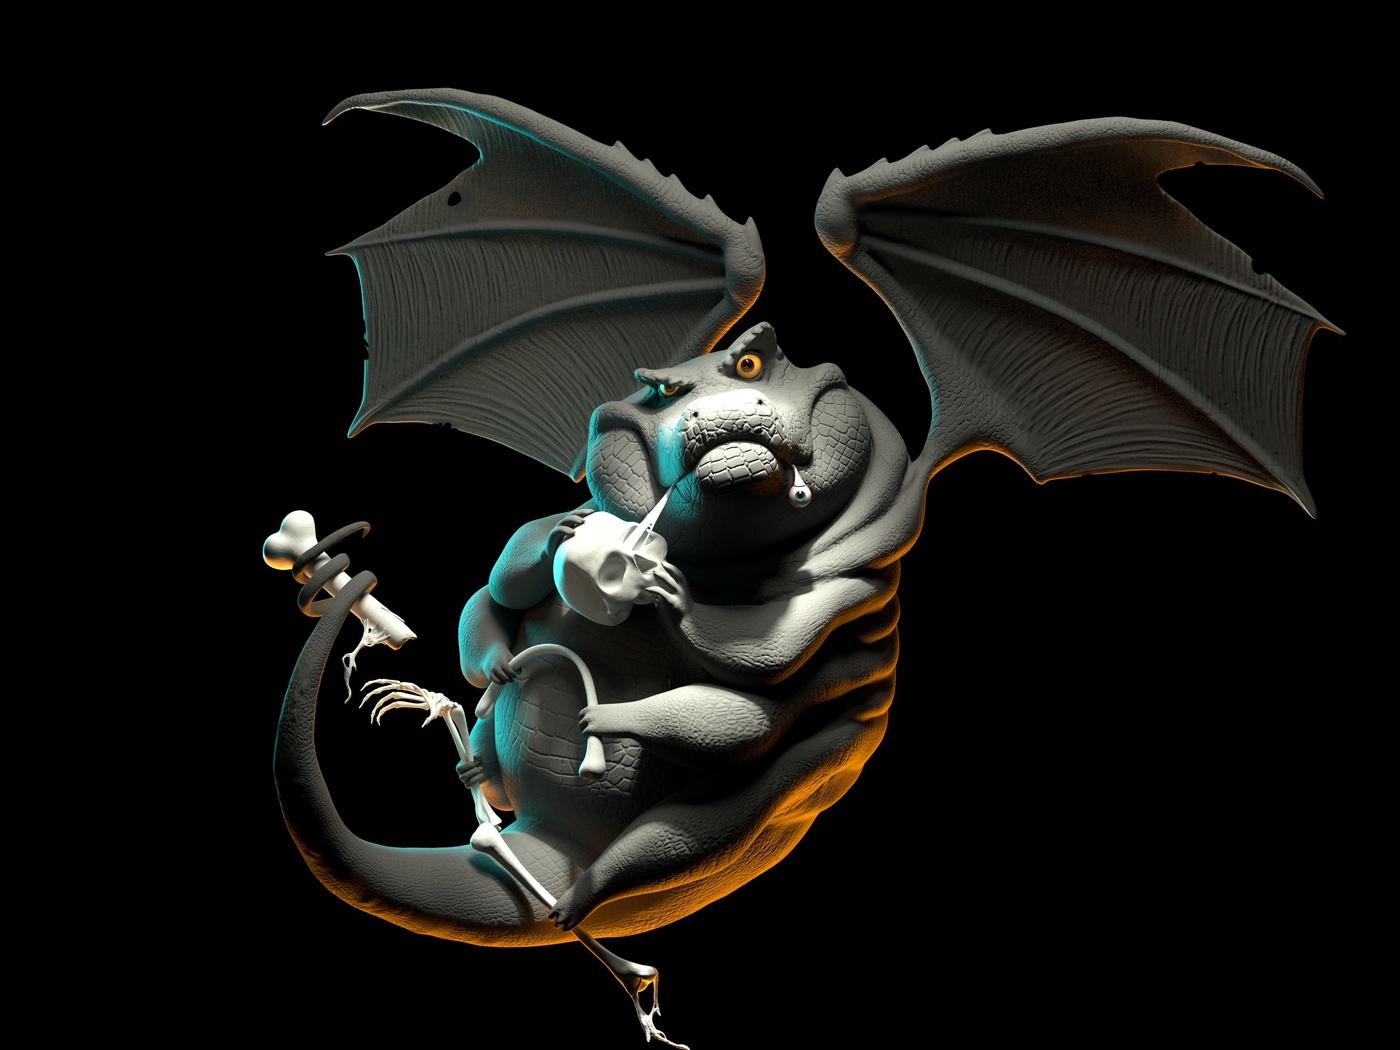 reptilian creature 3d model